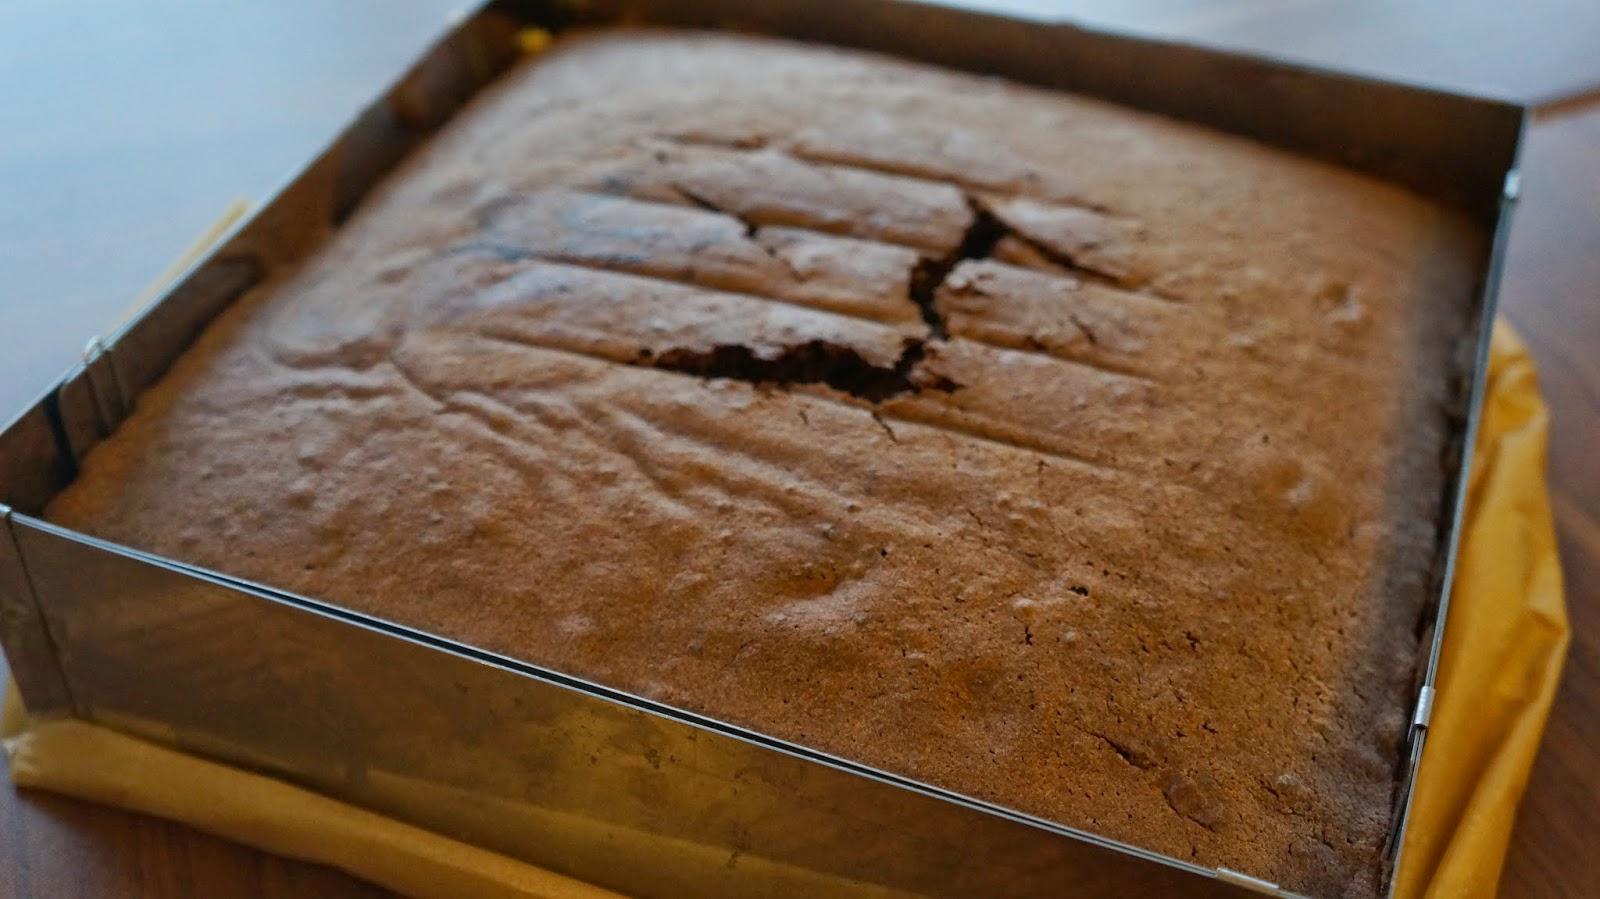 Kuchenfee Lisa Biskuit ~ kuchenfee lisa böden sacherart rezept& tutorial